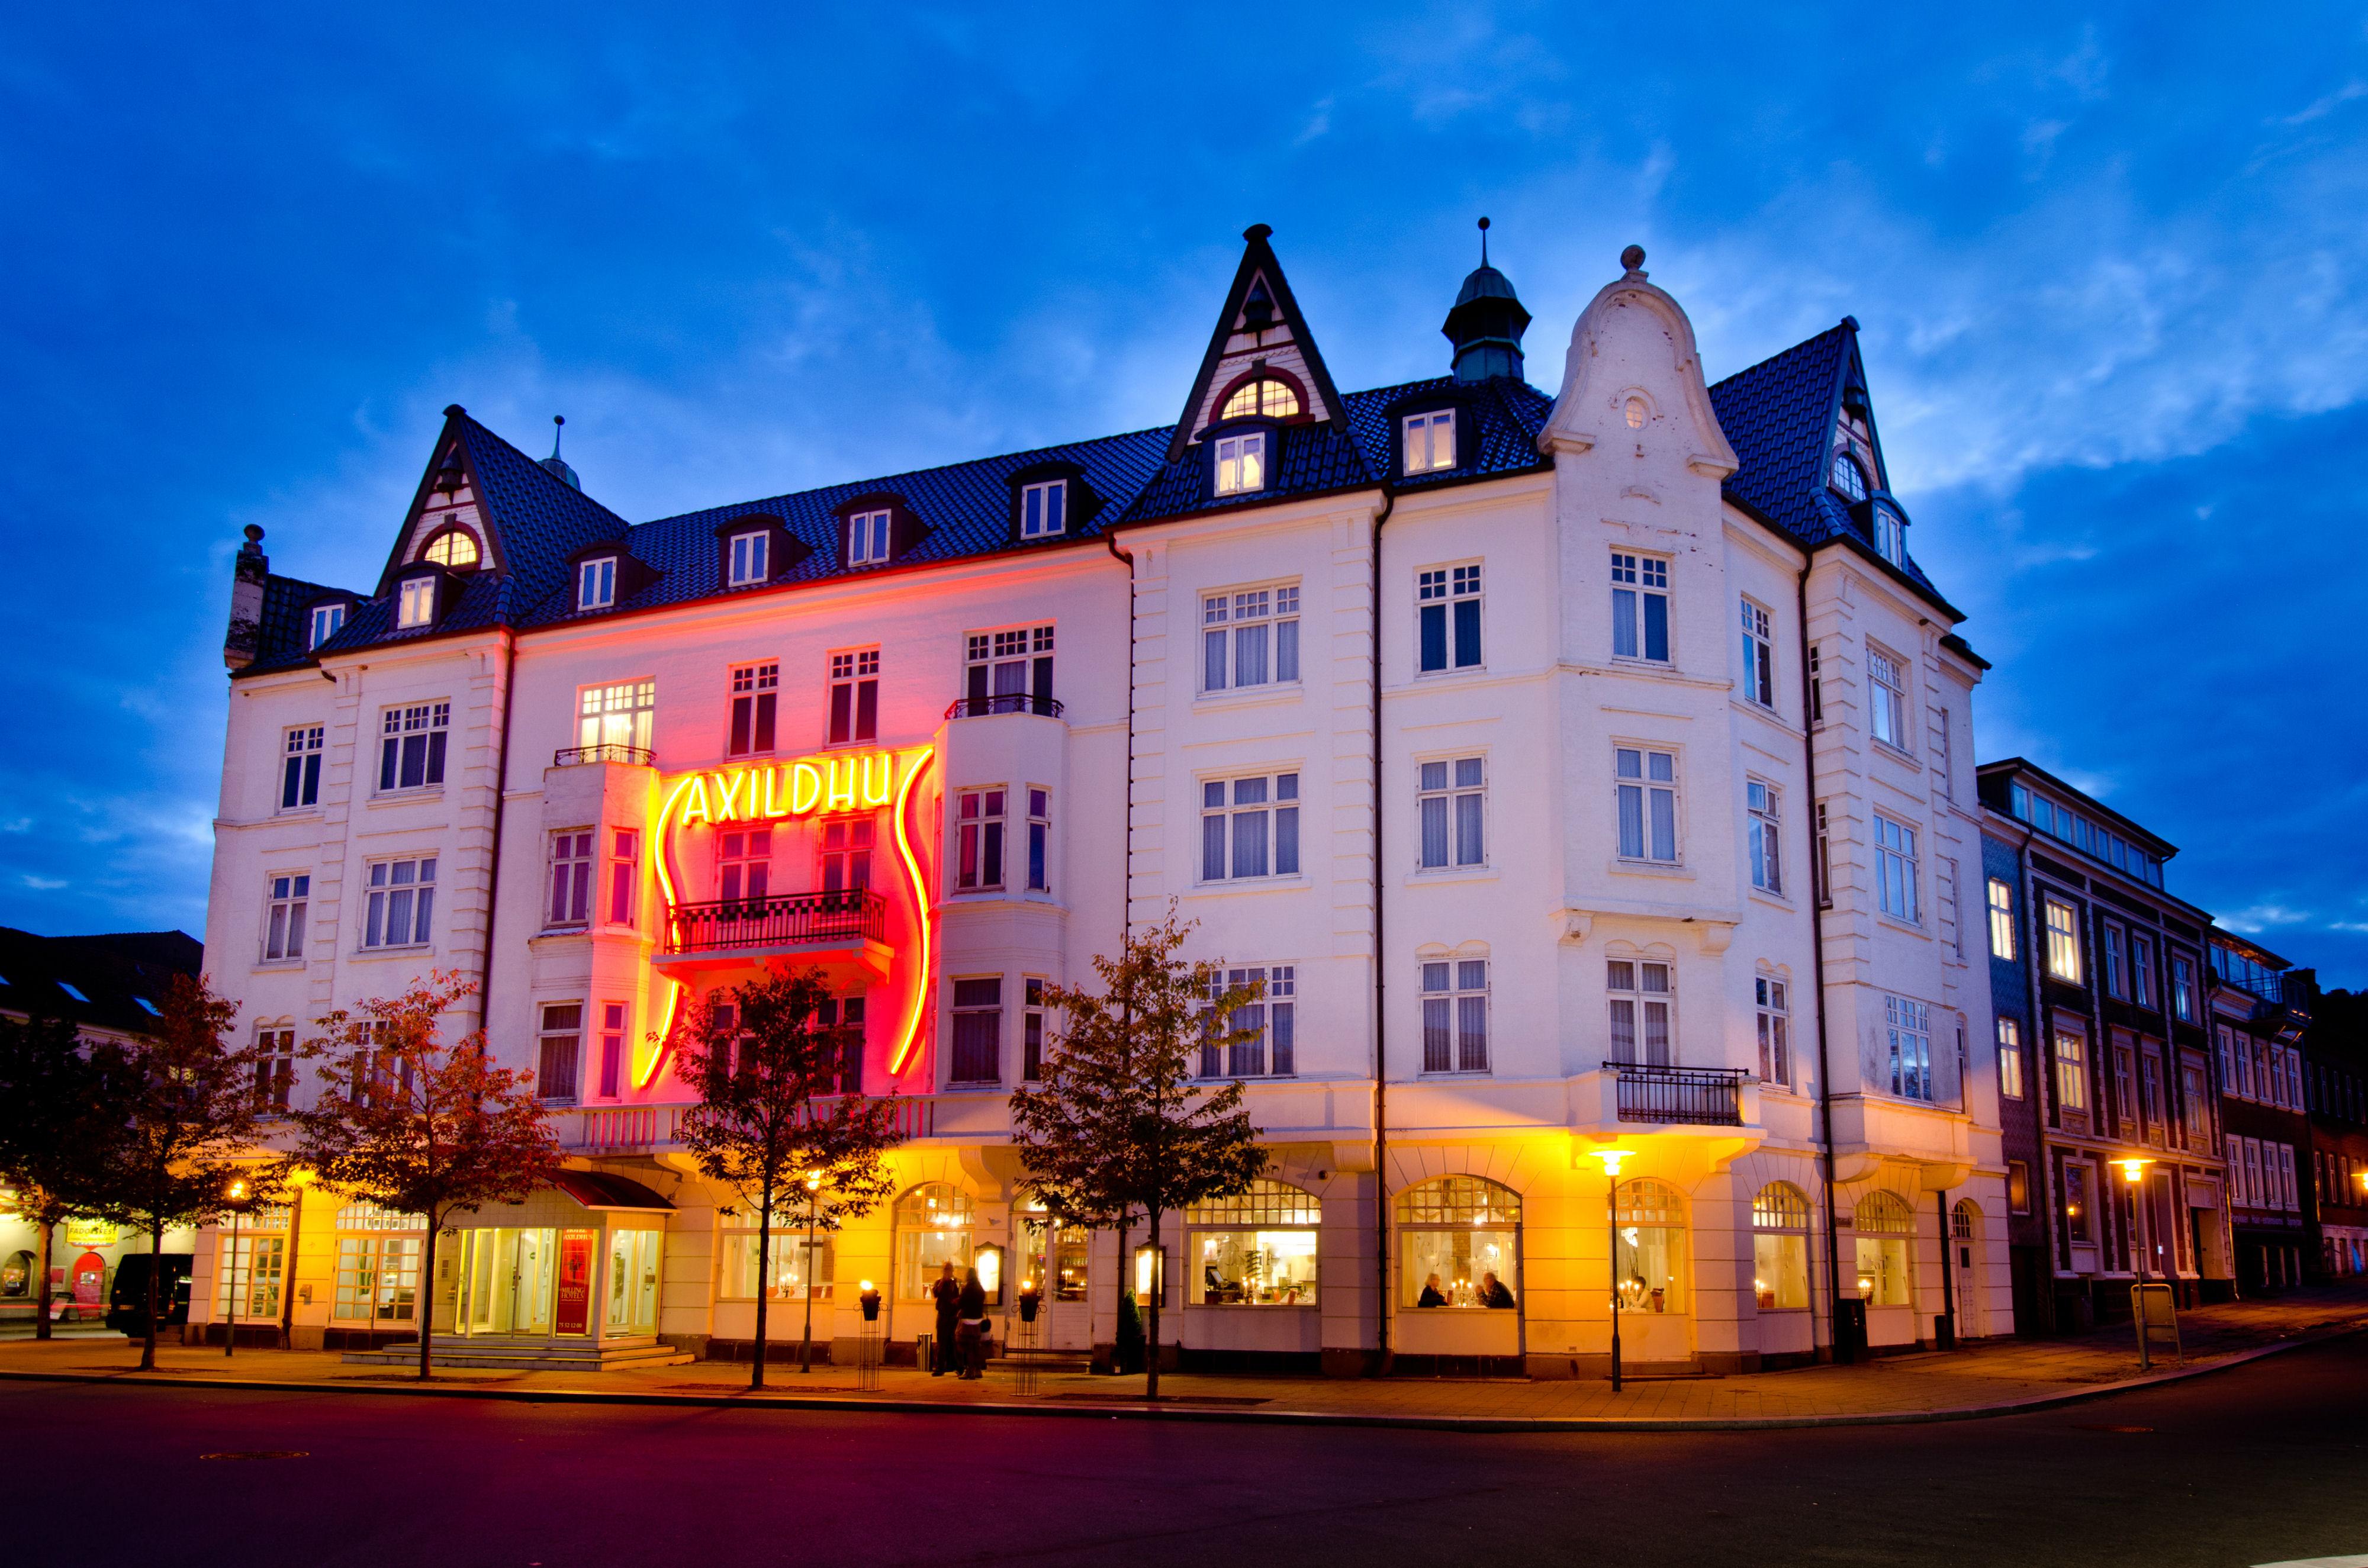 århus onsdag annonce wellness hotel nordtyskland